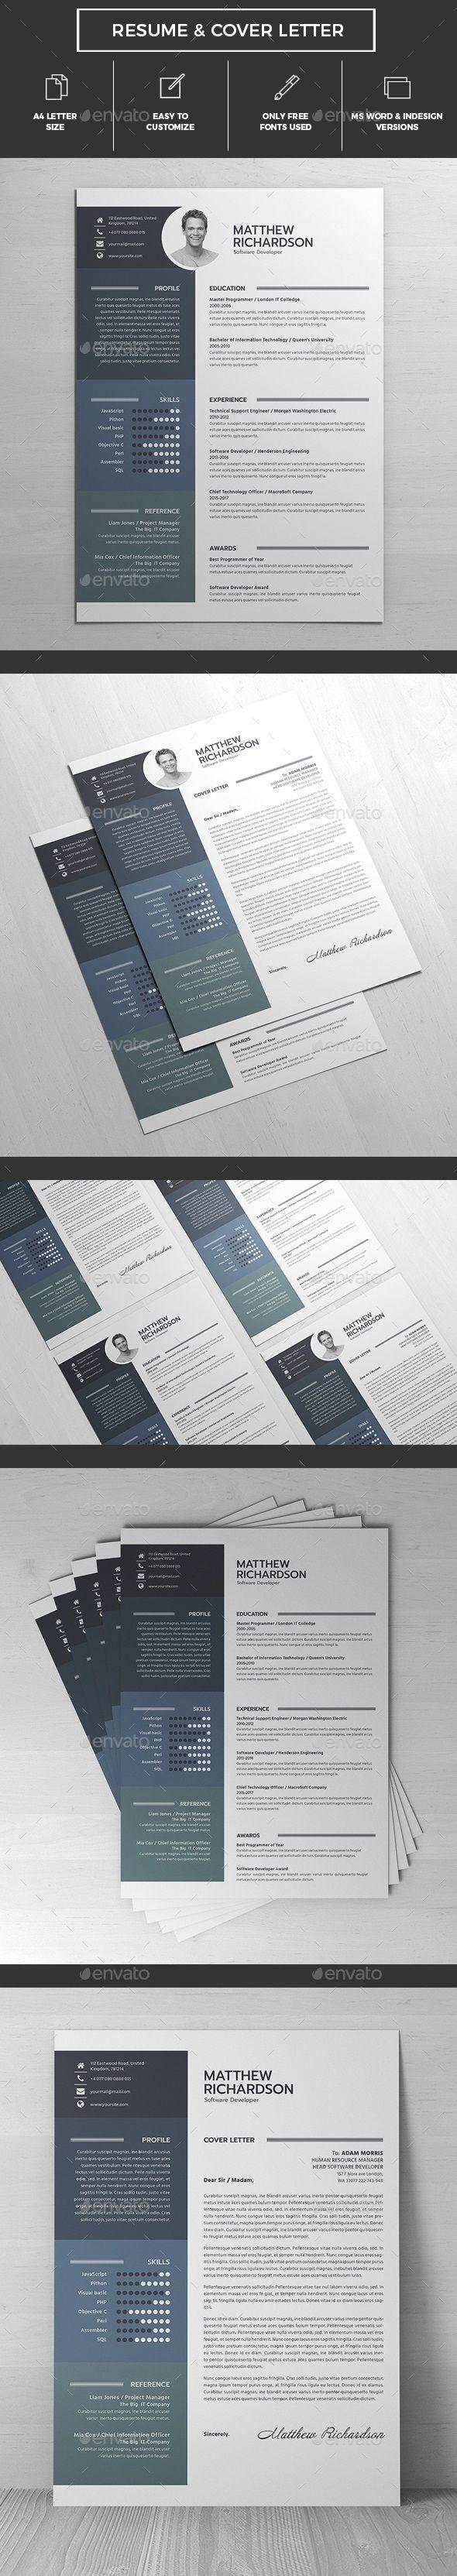 Resume 312 best Resume images on Pinterest